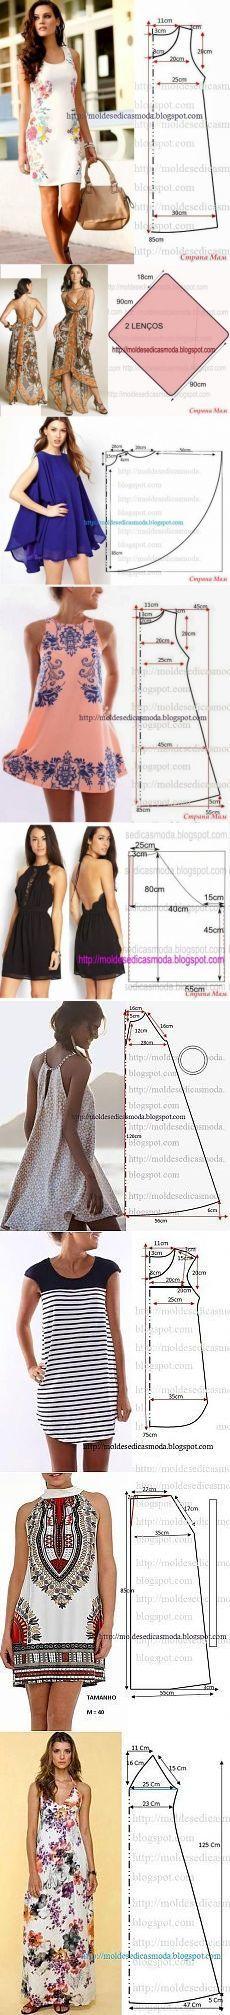 Simple pattern trendy summer dresses.